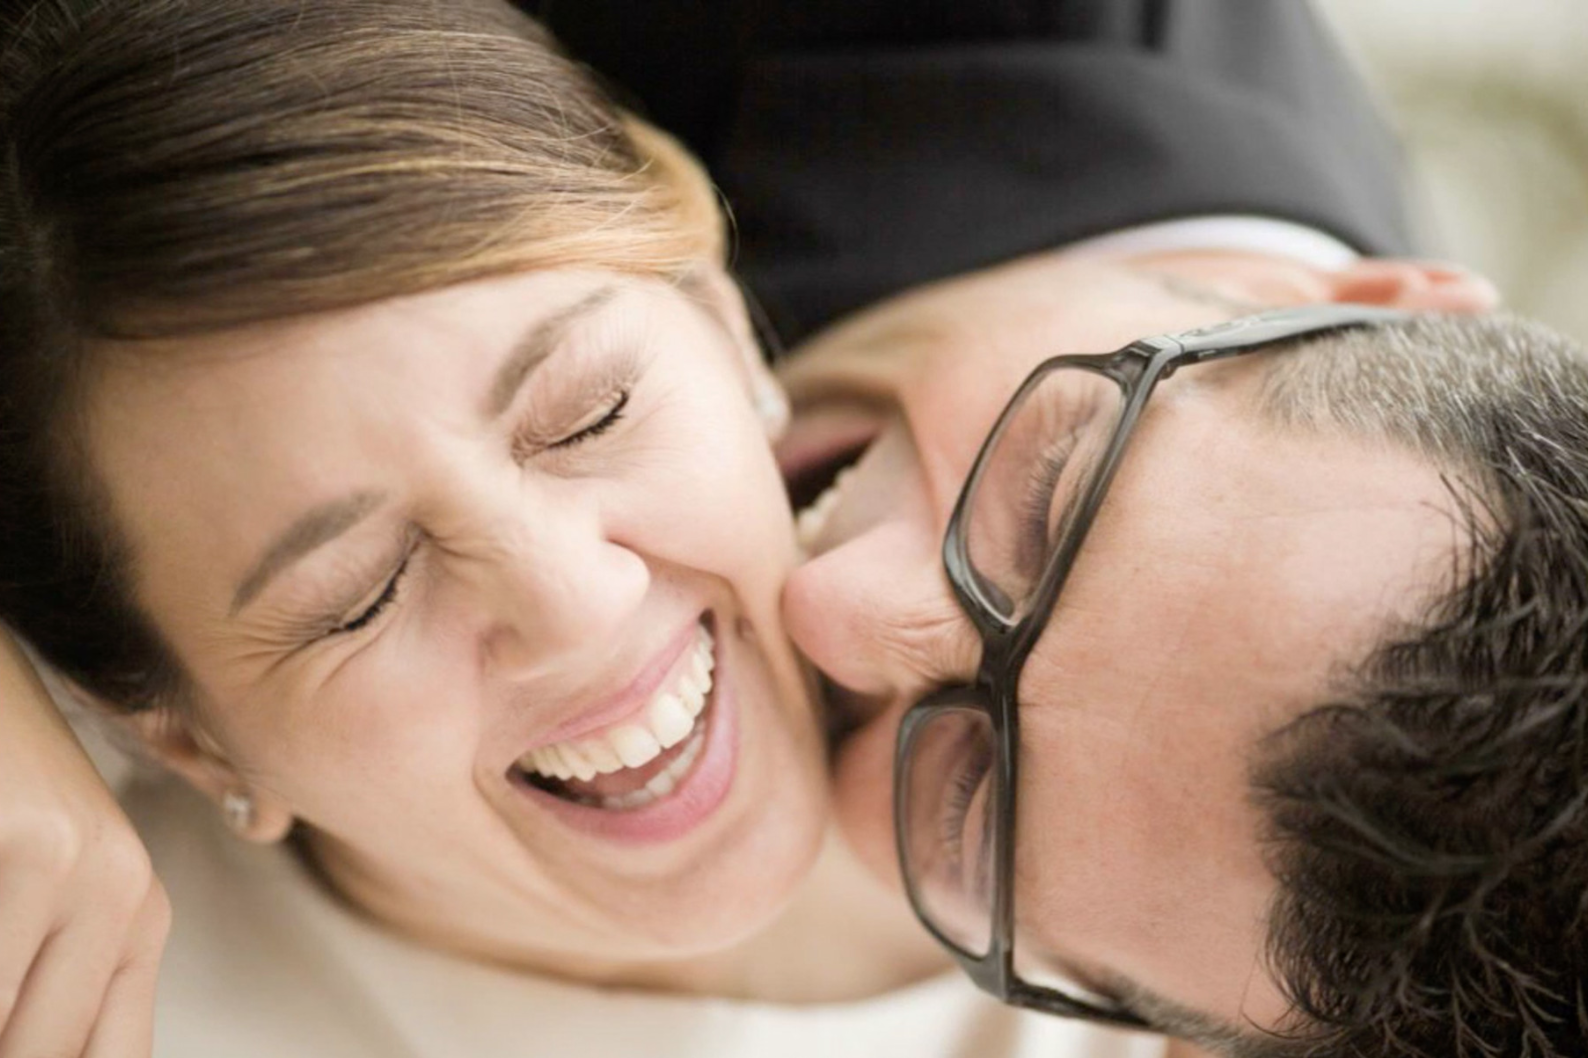 Fotografo Matrimonio San Donato Milanese - Matrimonio Manuela e Davide